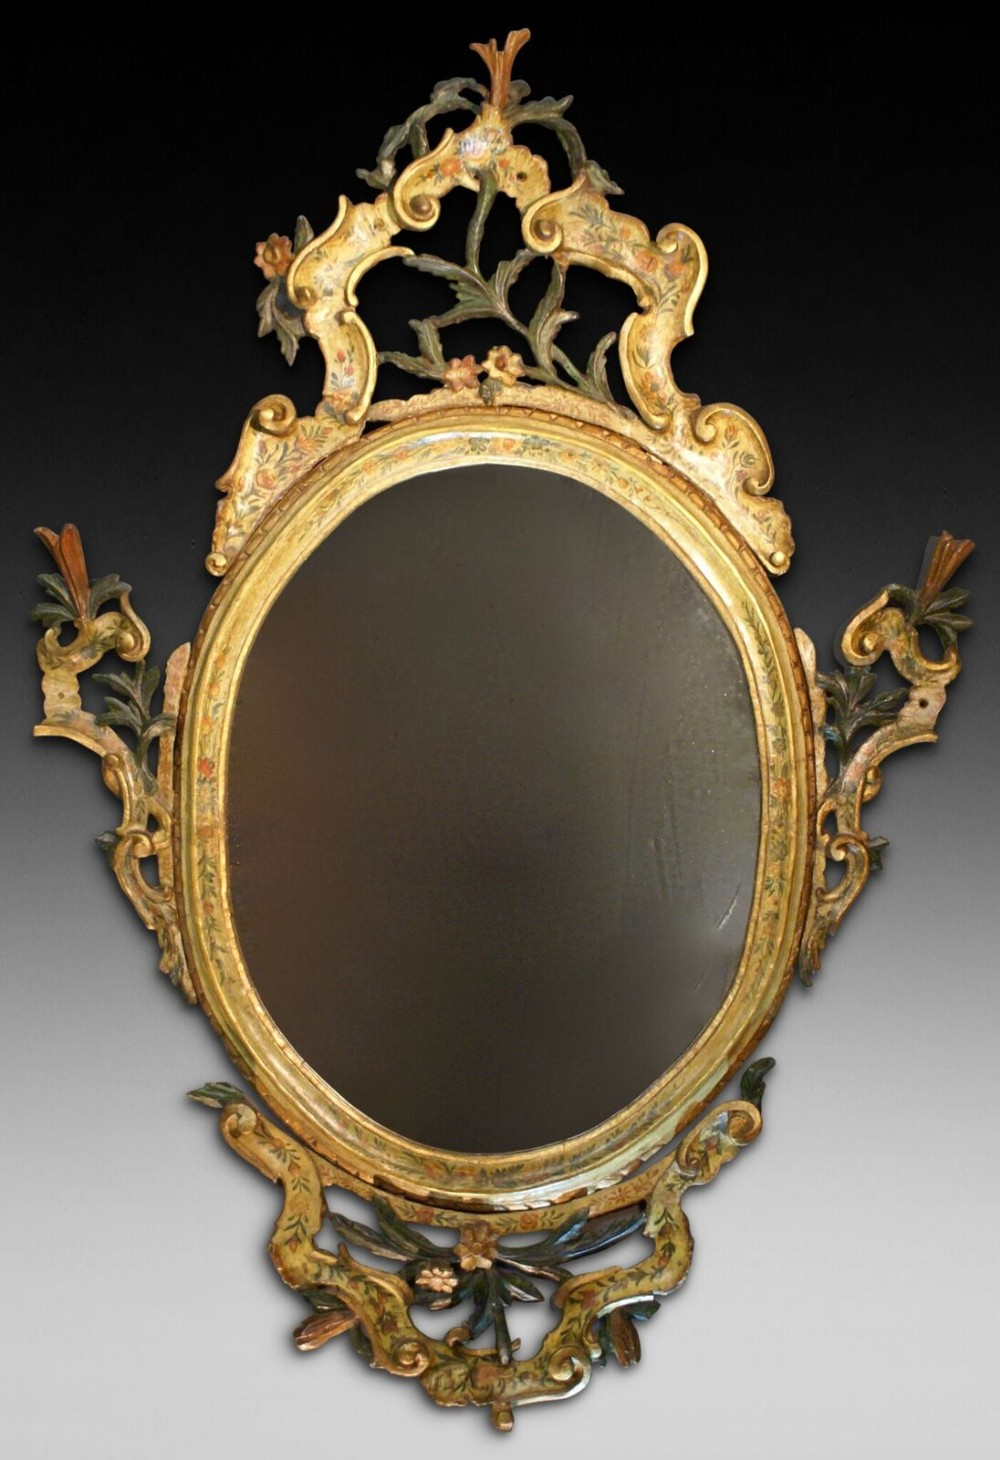 a rare 18th century venetian mirror